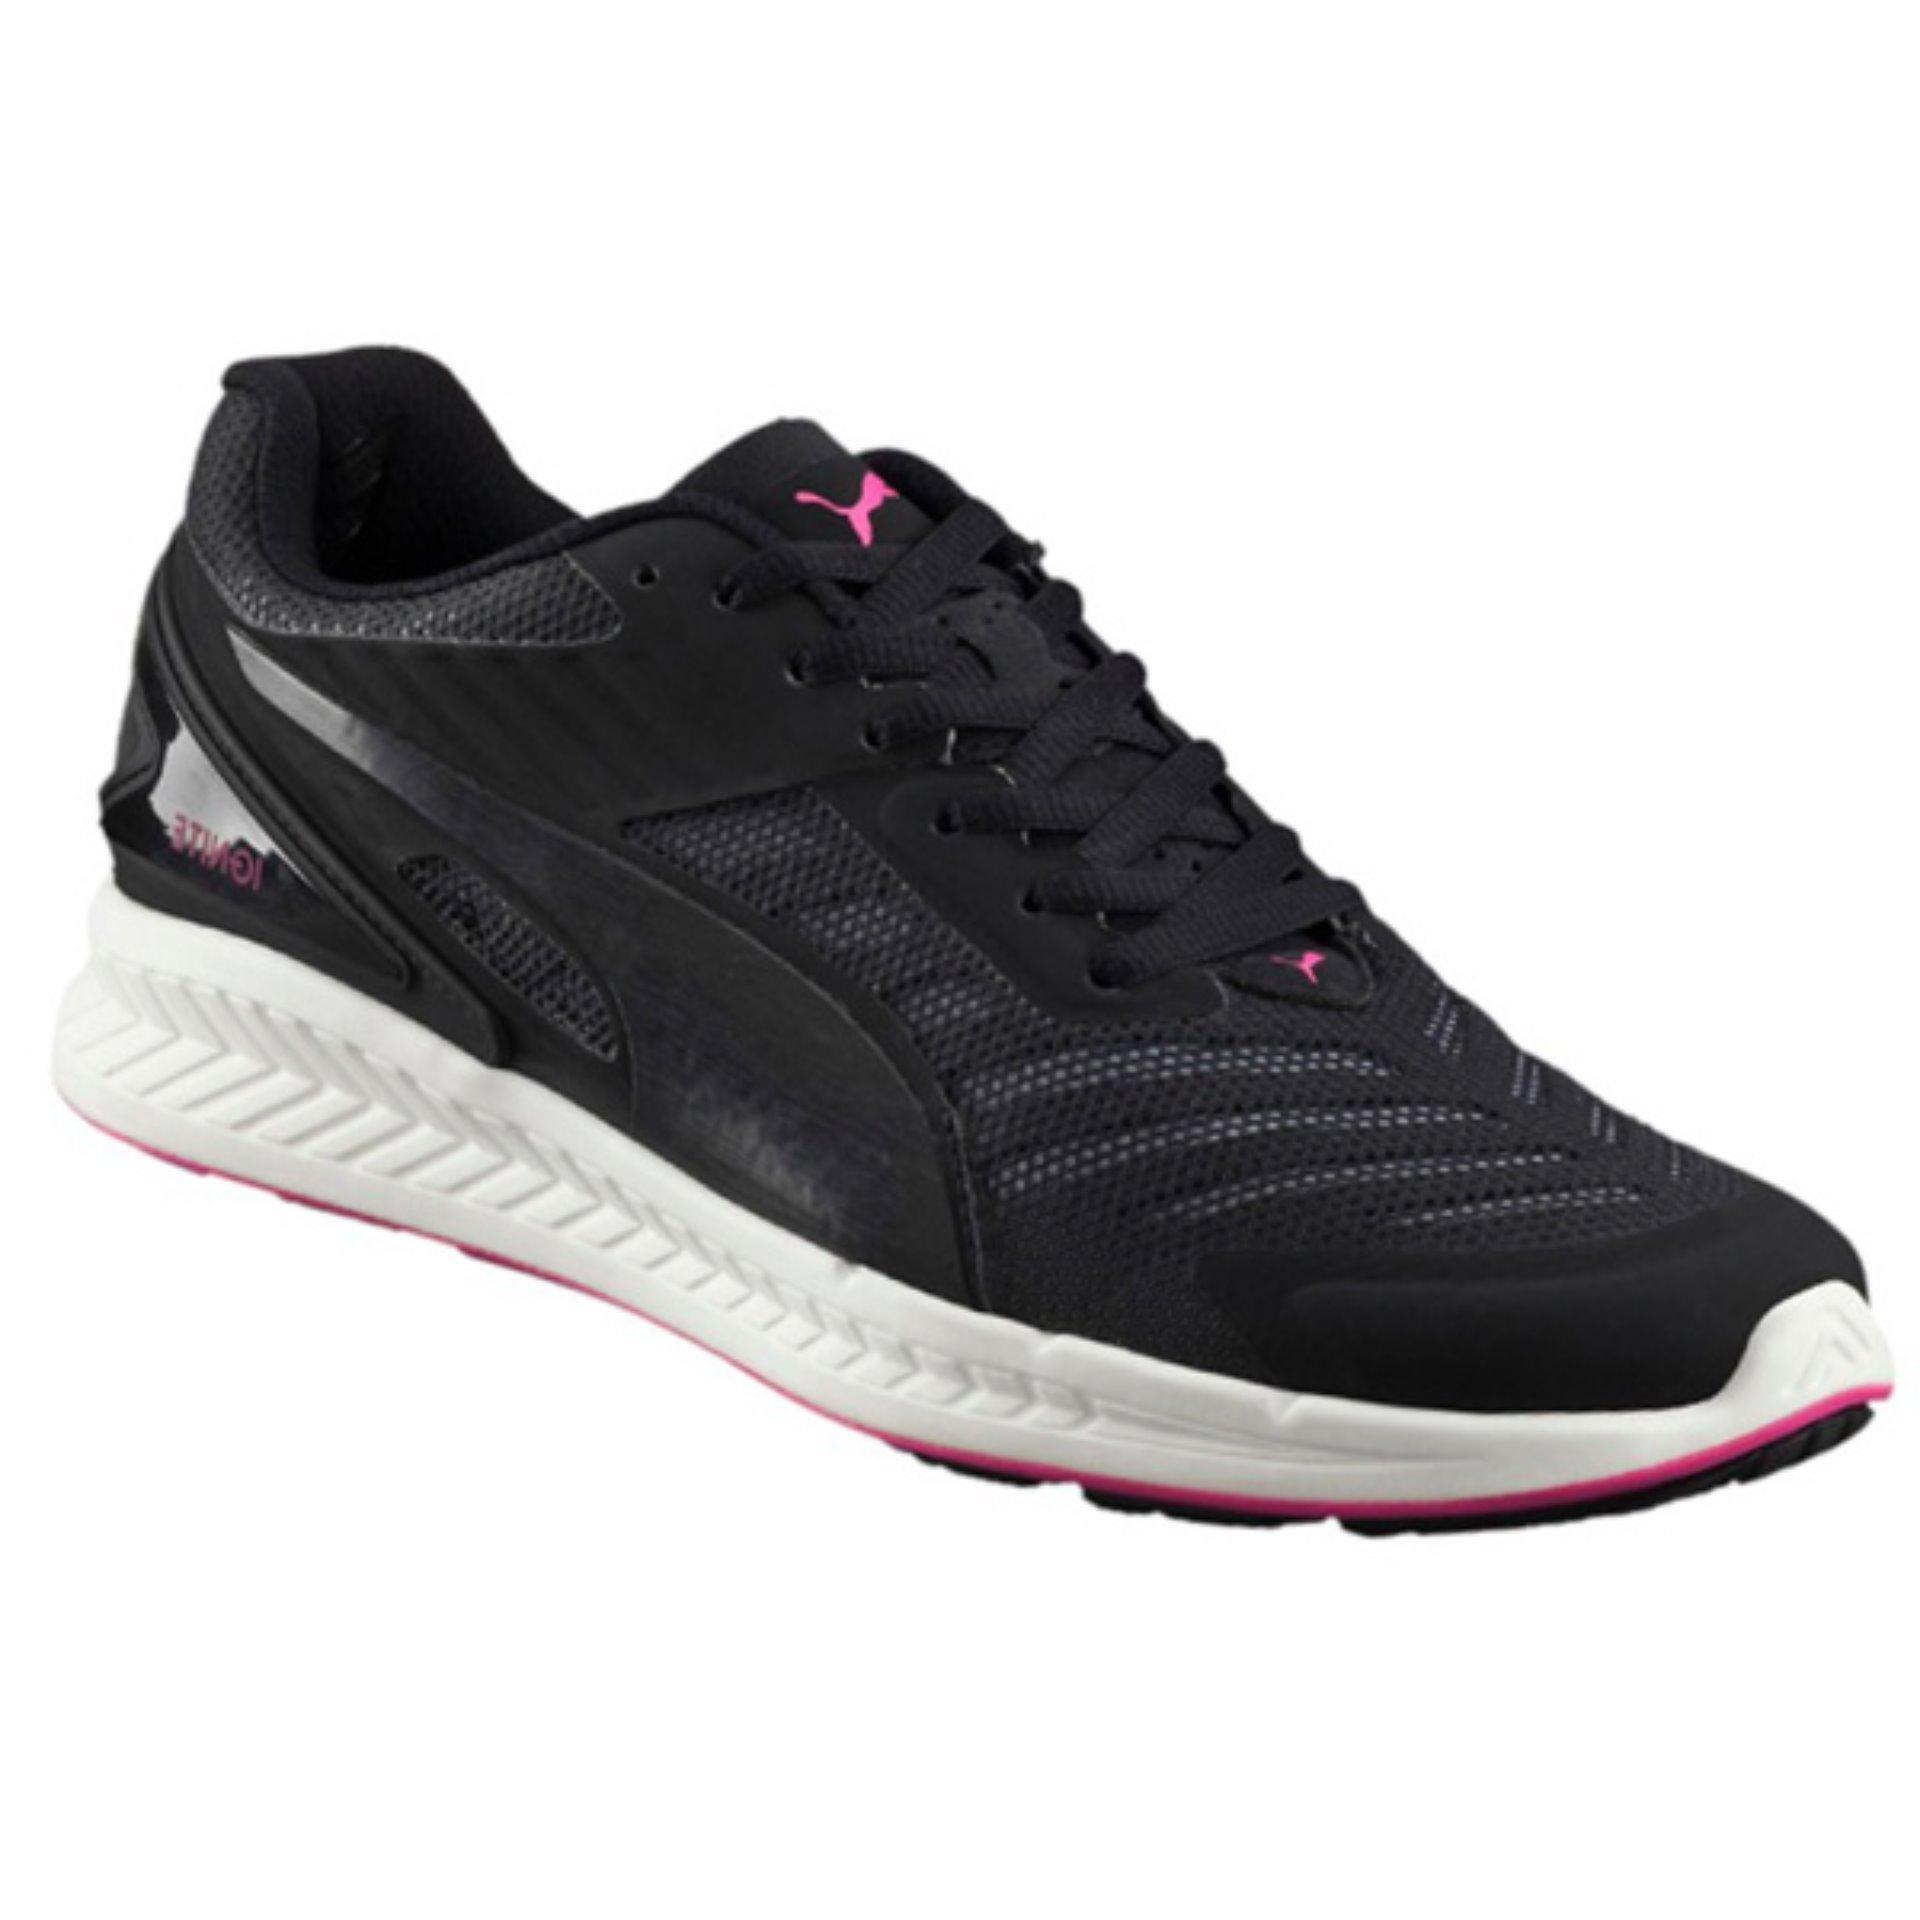 Puma Sepatu Running Ignite V2 18861207 Hitam - Update Daftar Harga ... ee9a476efa